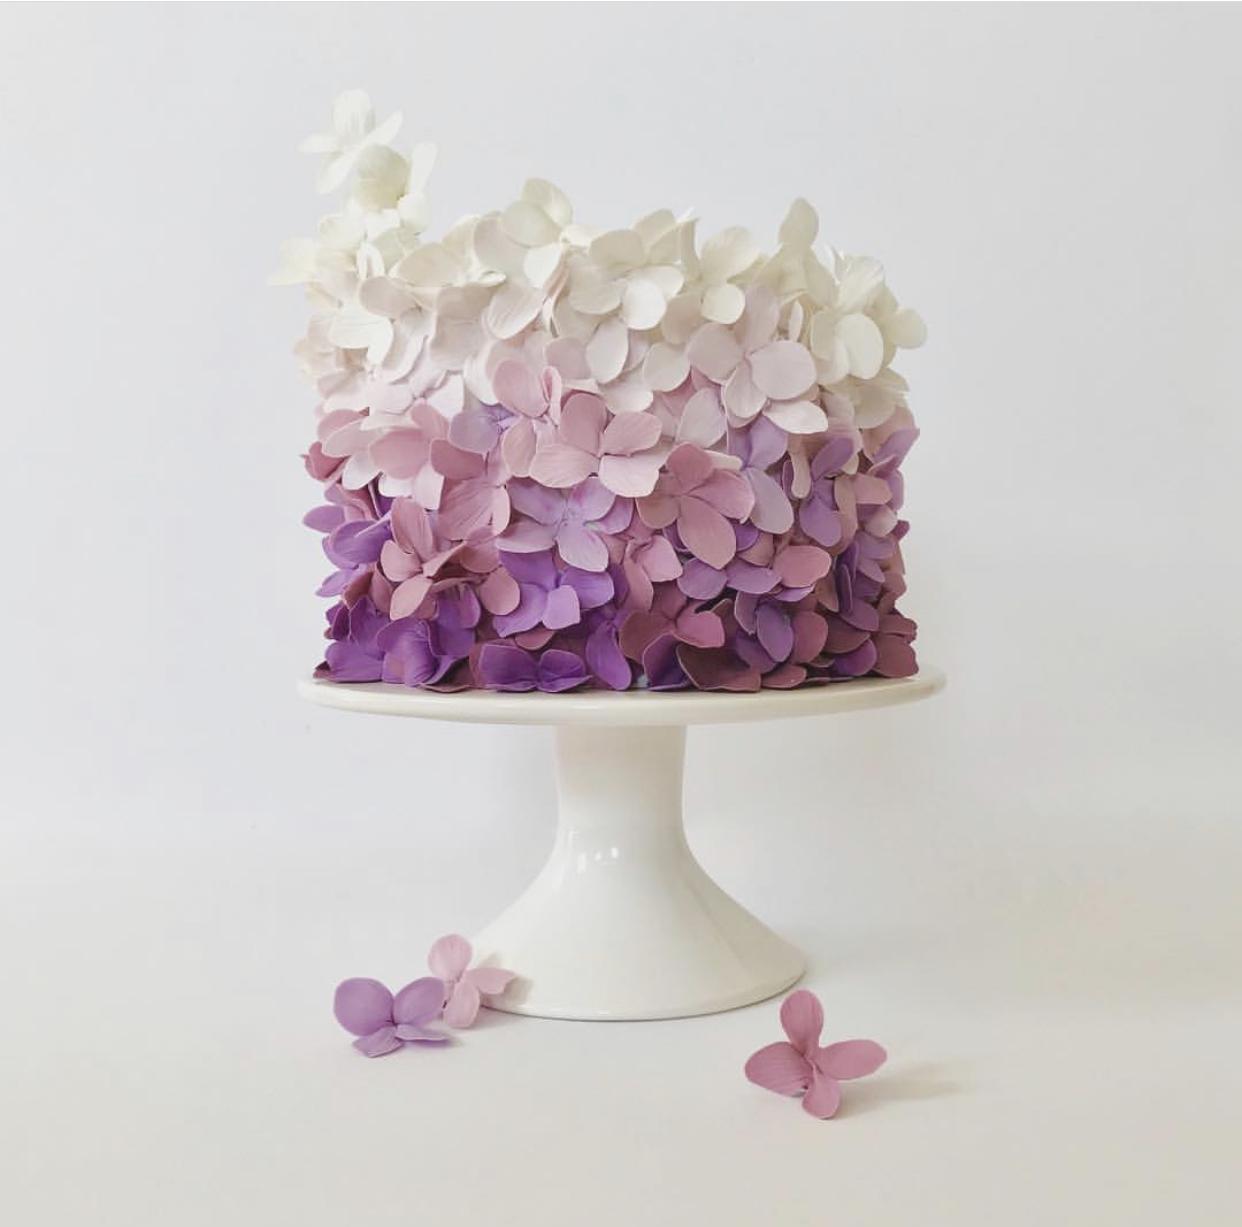 fine-art-wedding-cakes